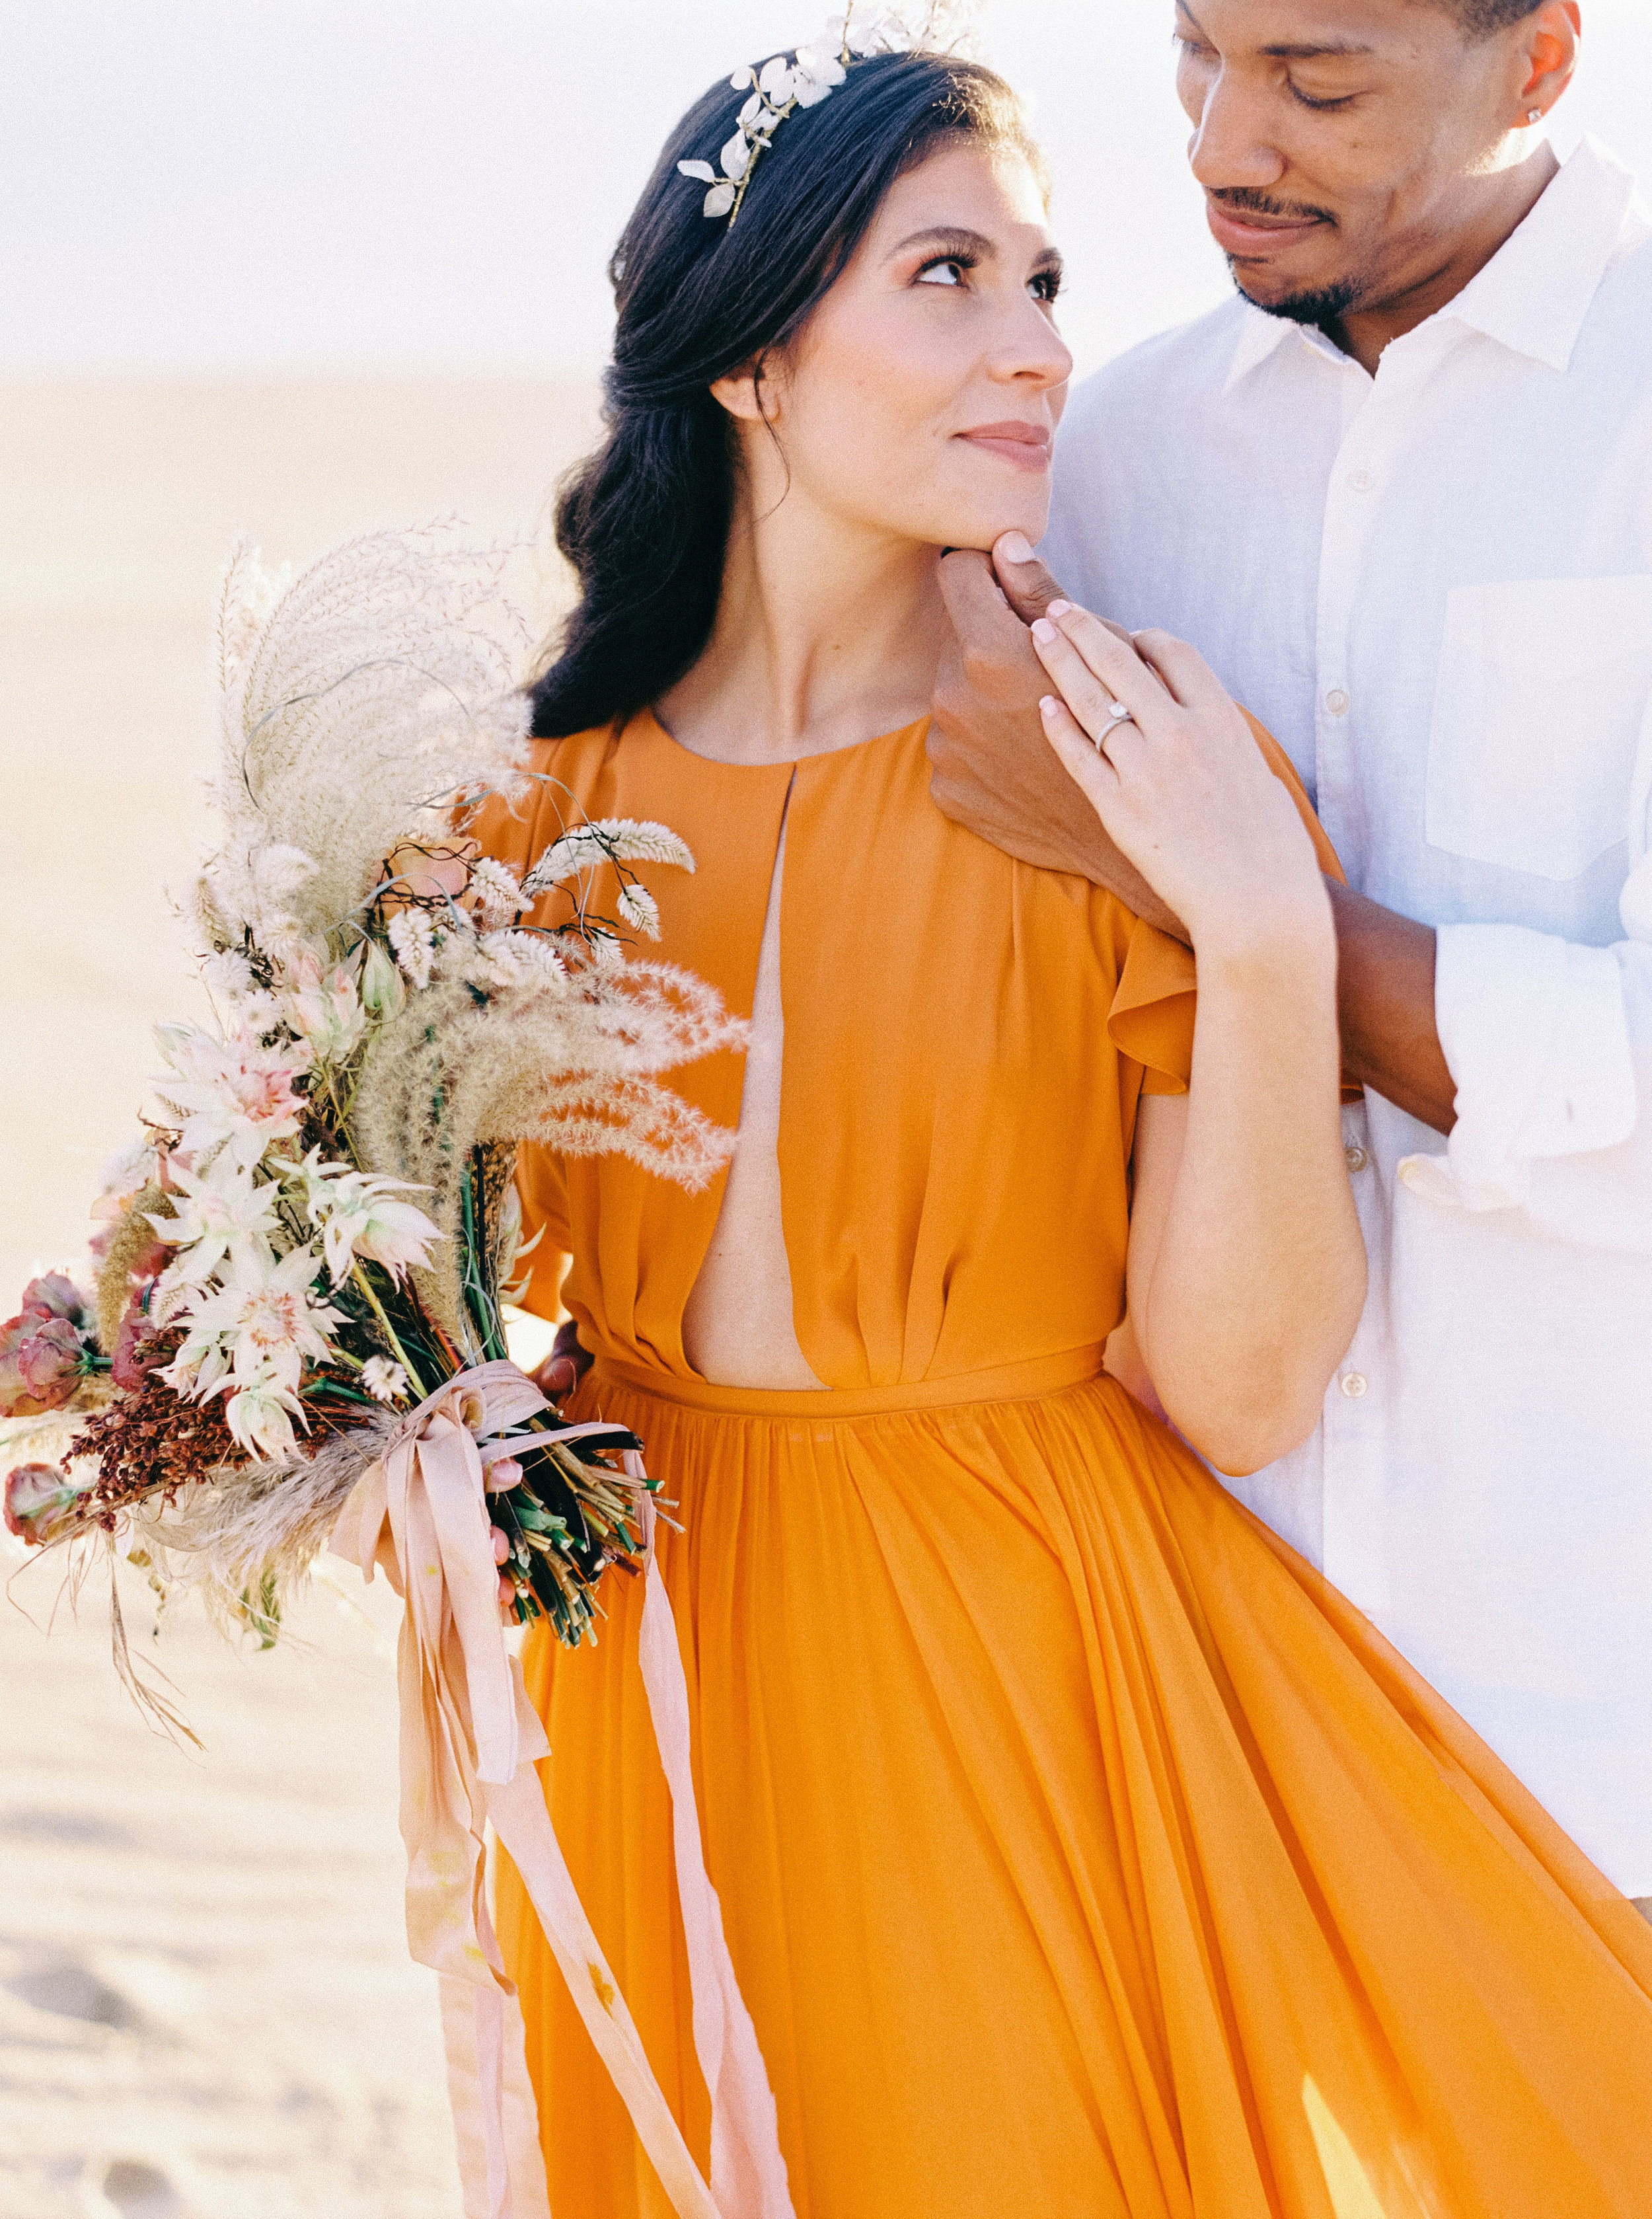 NikkiSanterre_FineArtFilmWeddingPhotographer_WeddingSparrowEditorial_AisleSociety_DesertEngagementSession-4.jpg